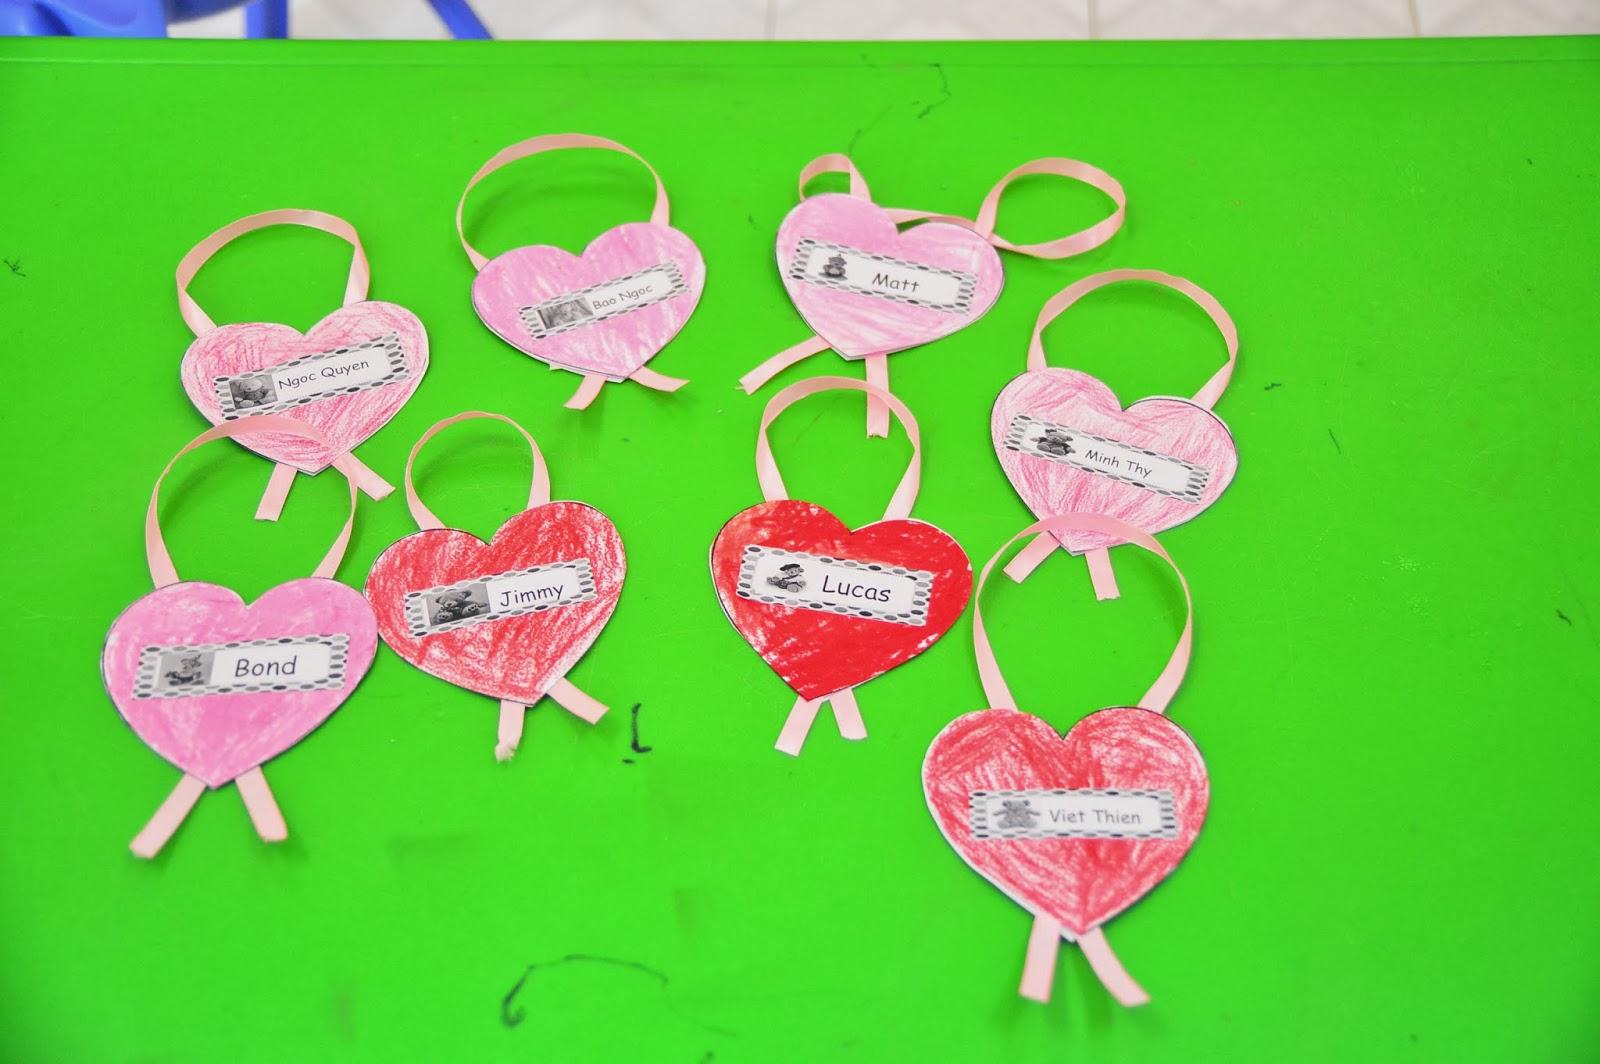 Kinder Talk Celebrate Valentine S Day With The Letterlanders